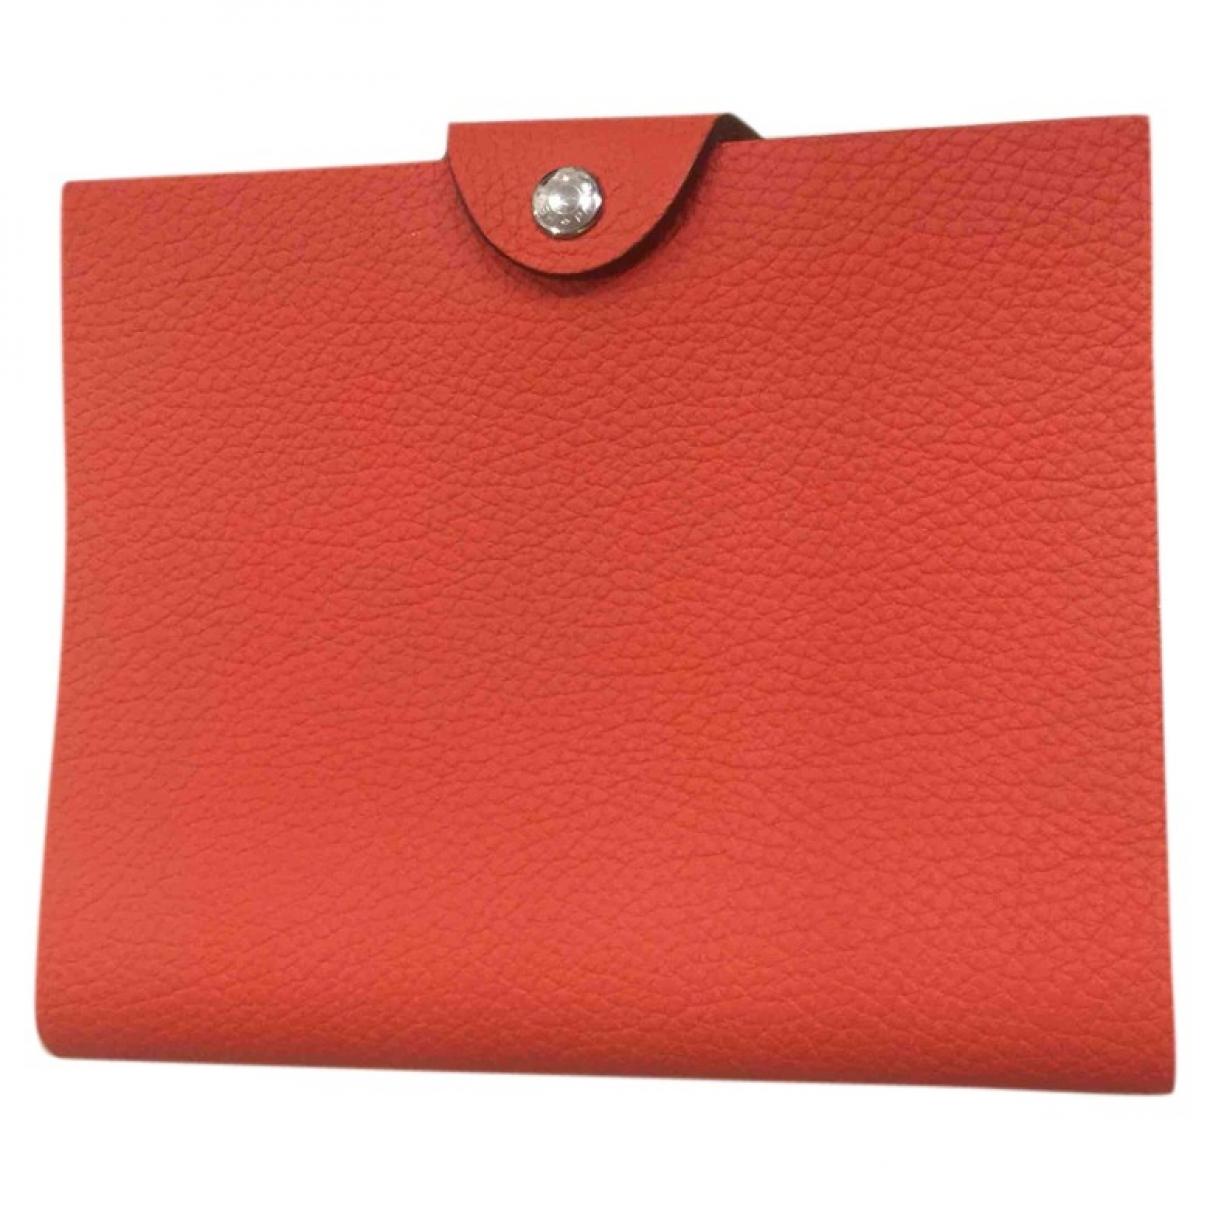 Hermes - Objets & Deco Ulysse PM pour lifestyle en cuir - rose